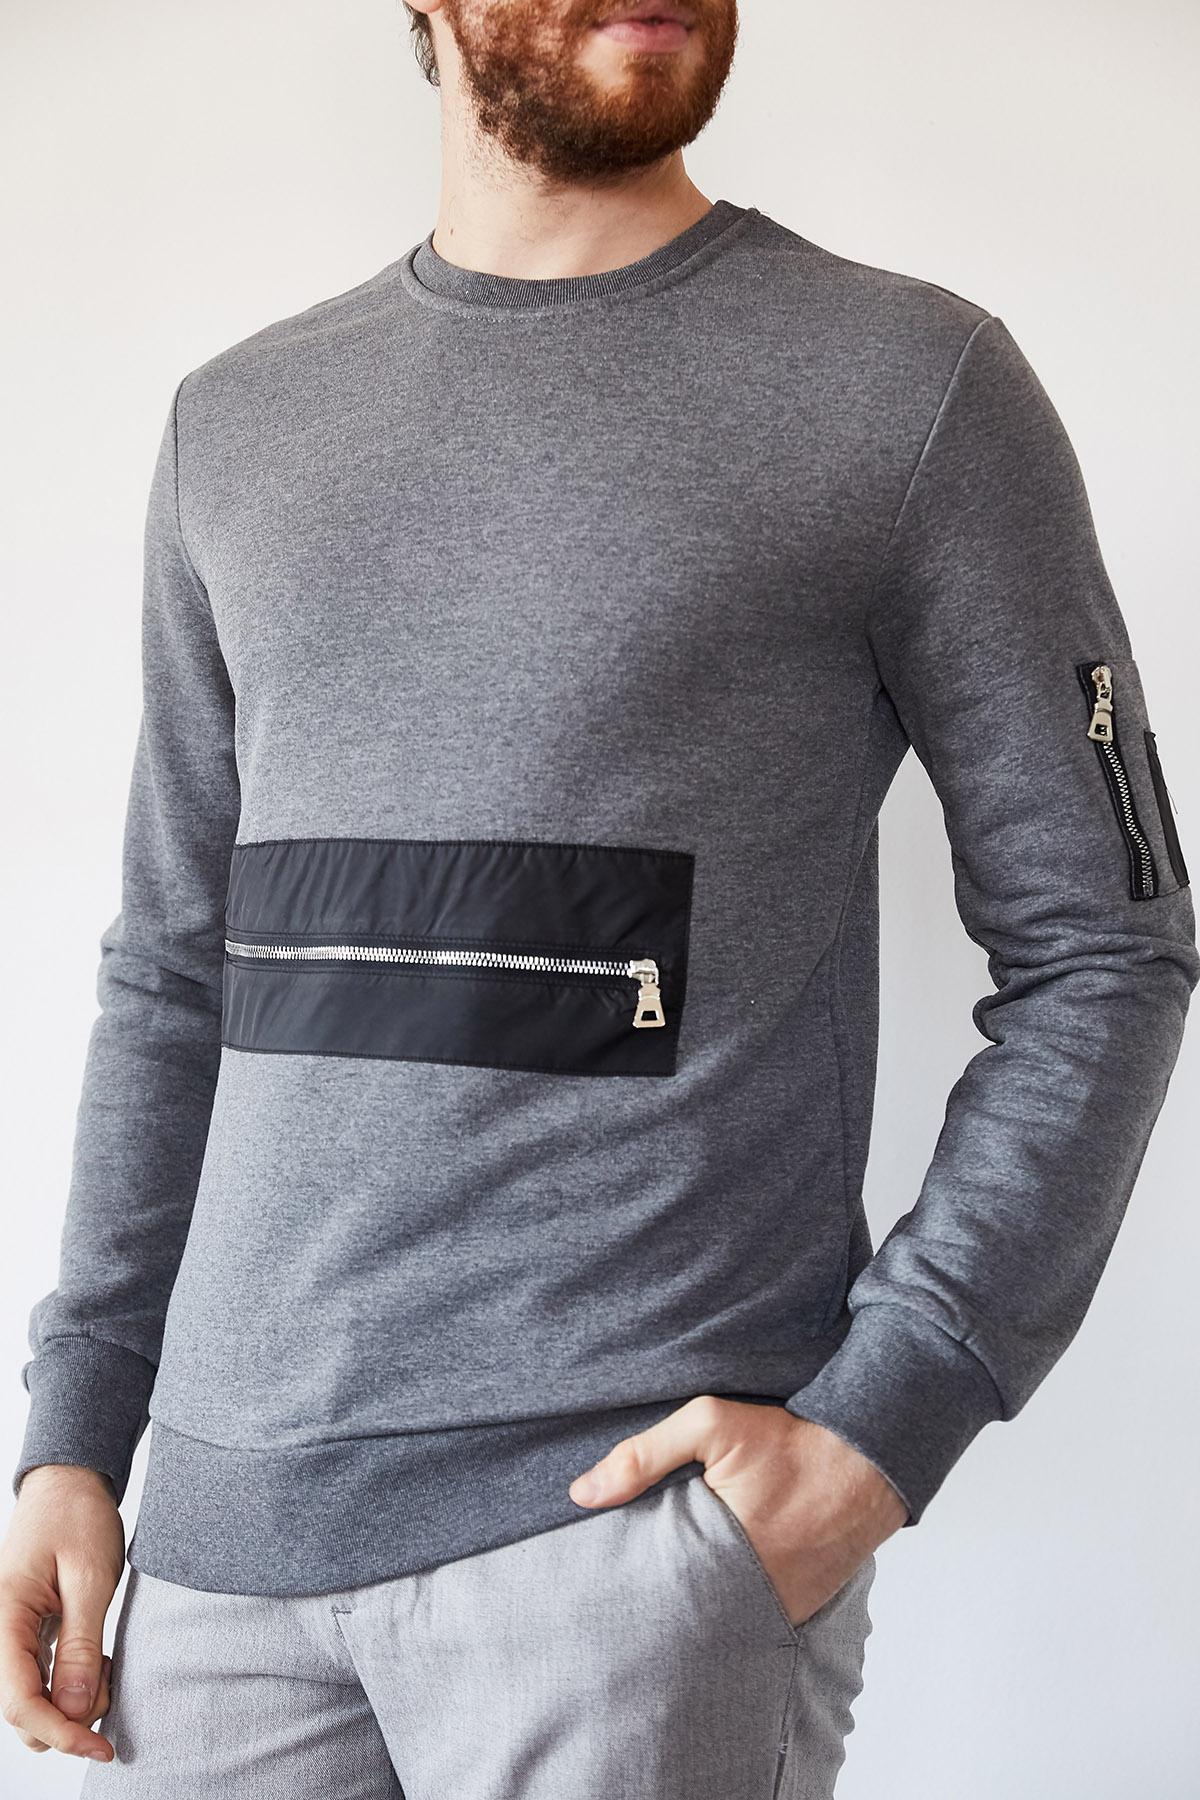 - Gri Fermuarlı Detaylı Garnili Sweatshirt 1KXE8-44237-03